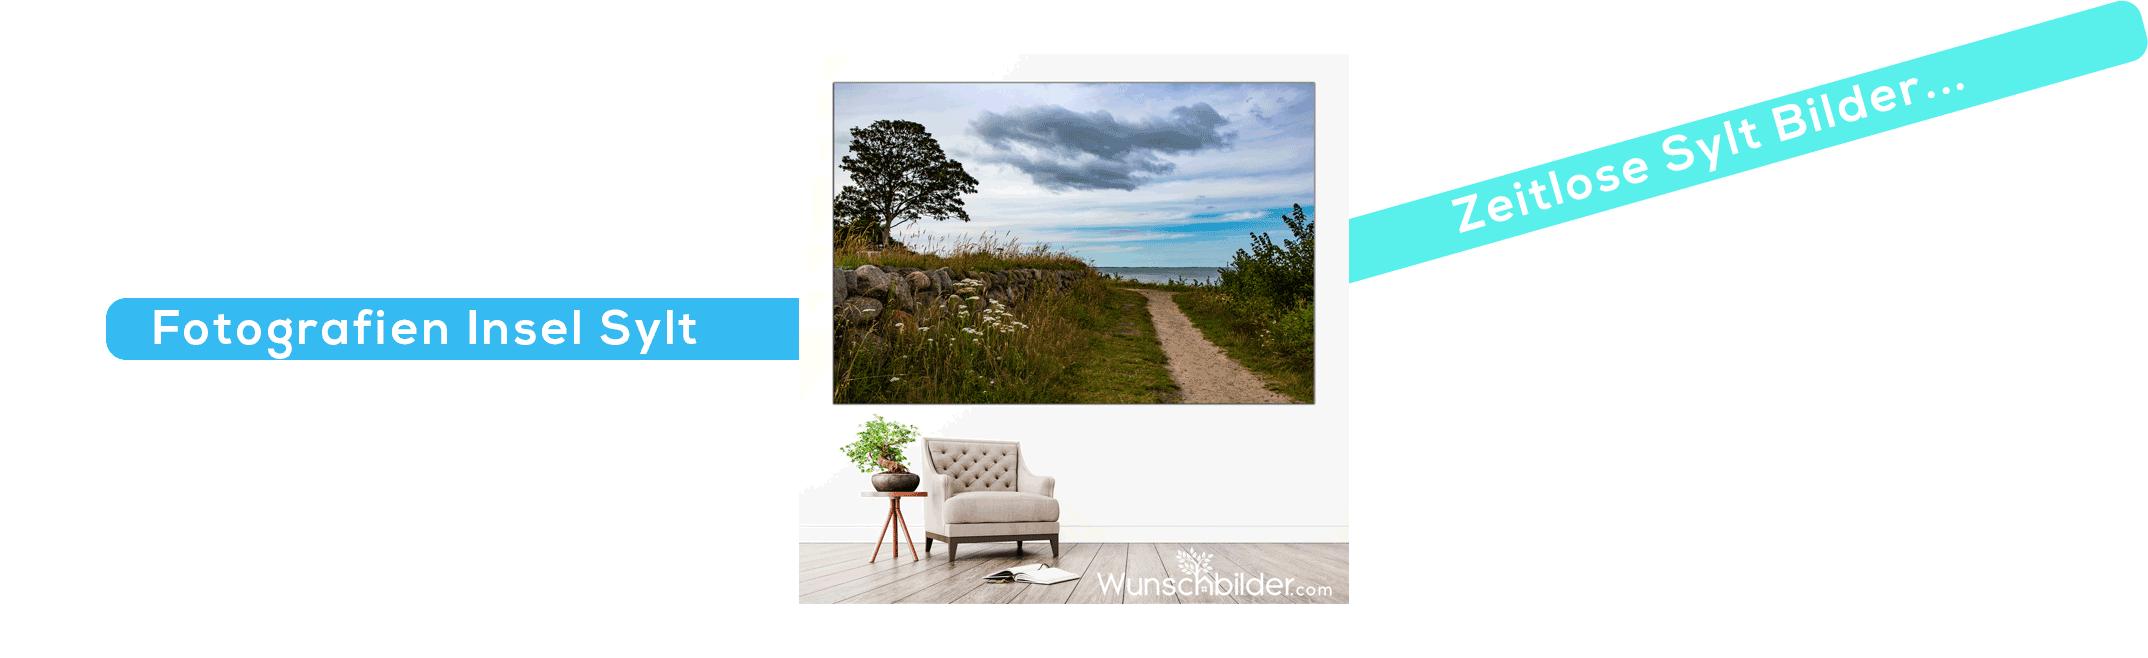 Fantastische Fotografien der Insel Sylt